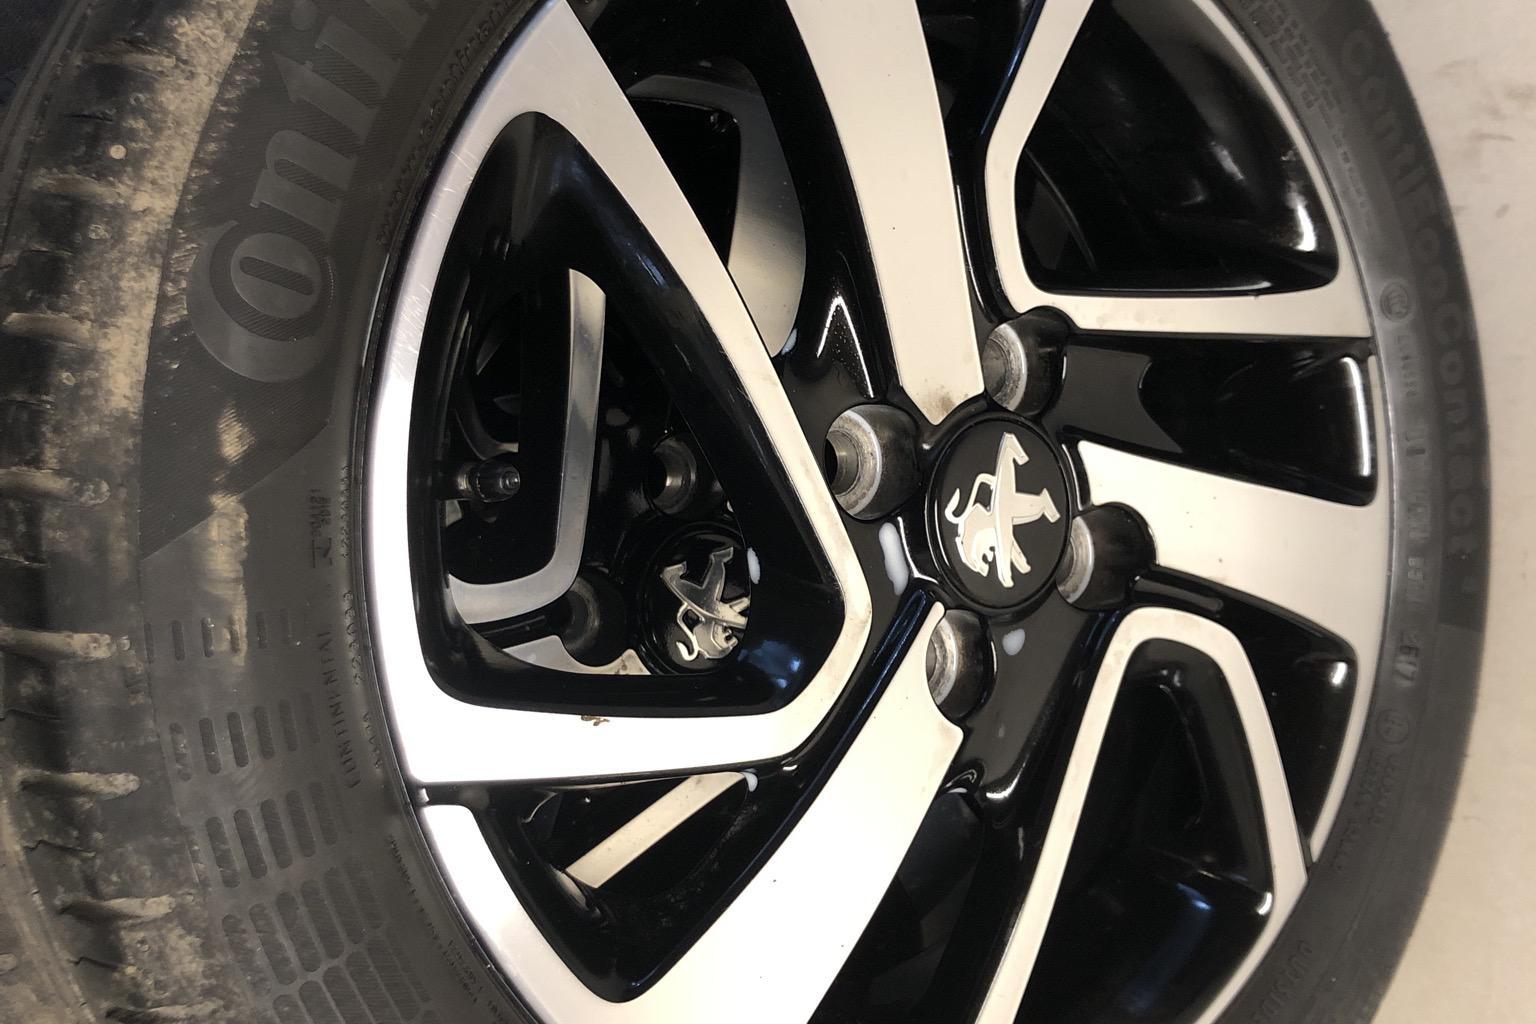 Peugeot 108 PureTech 5dr (68hk) - 21 250 km - Manual - black - 2018